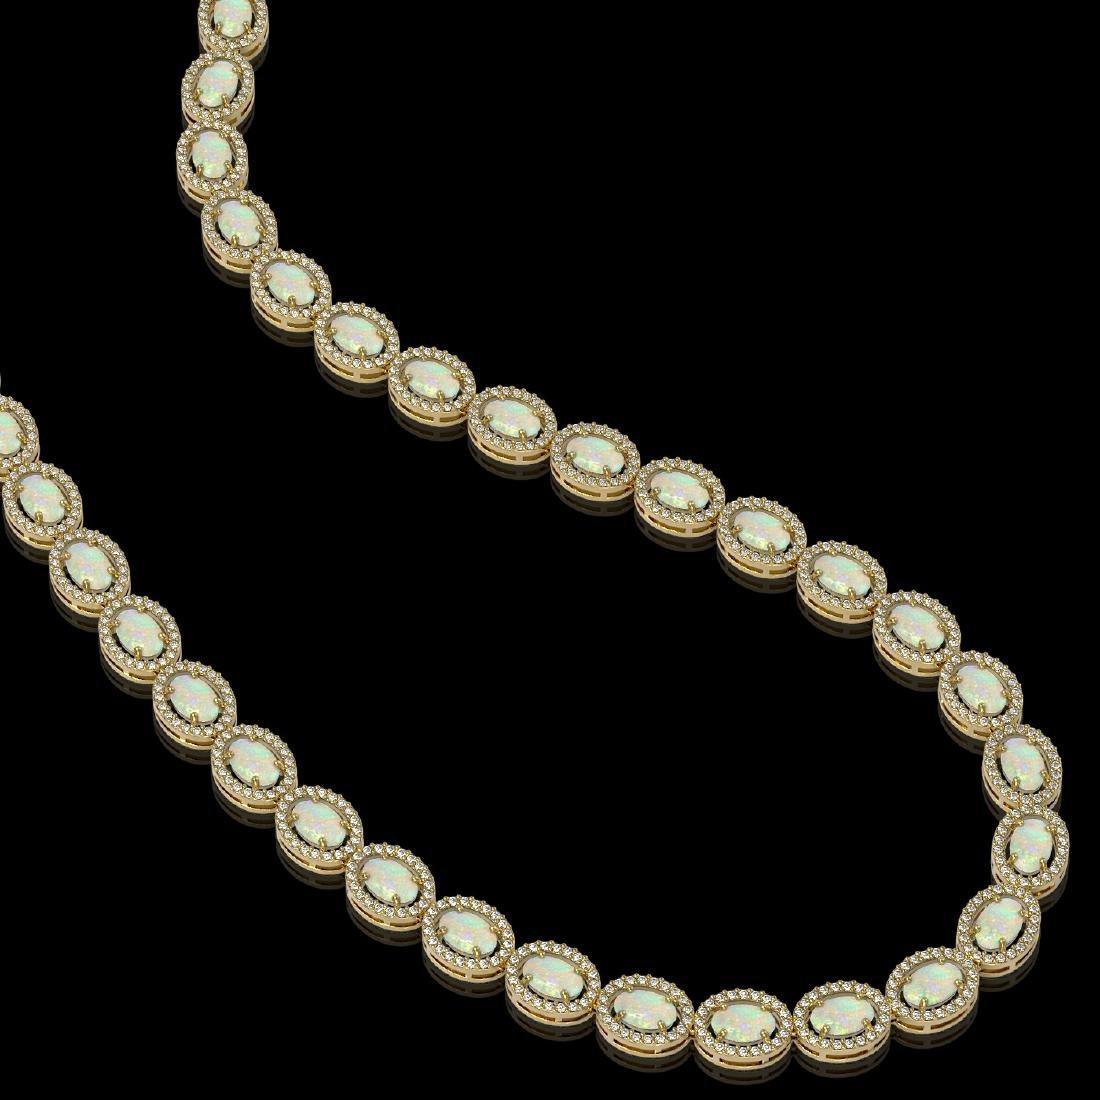 21.21 CTW Opal & Diamond Halo Necklace 10K Yellow Gold - 2